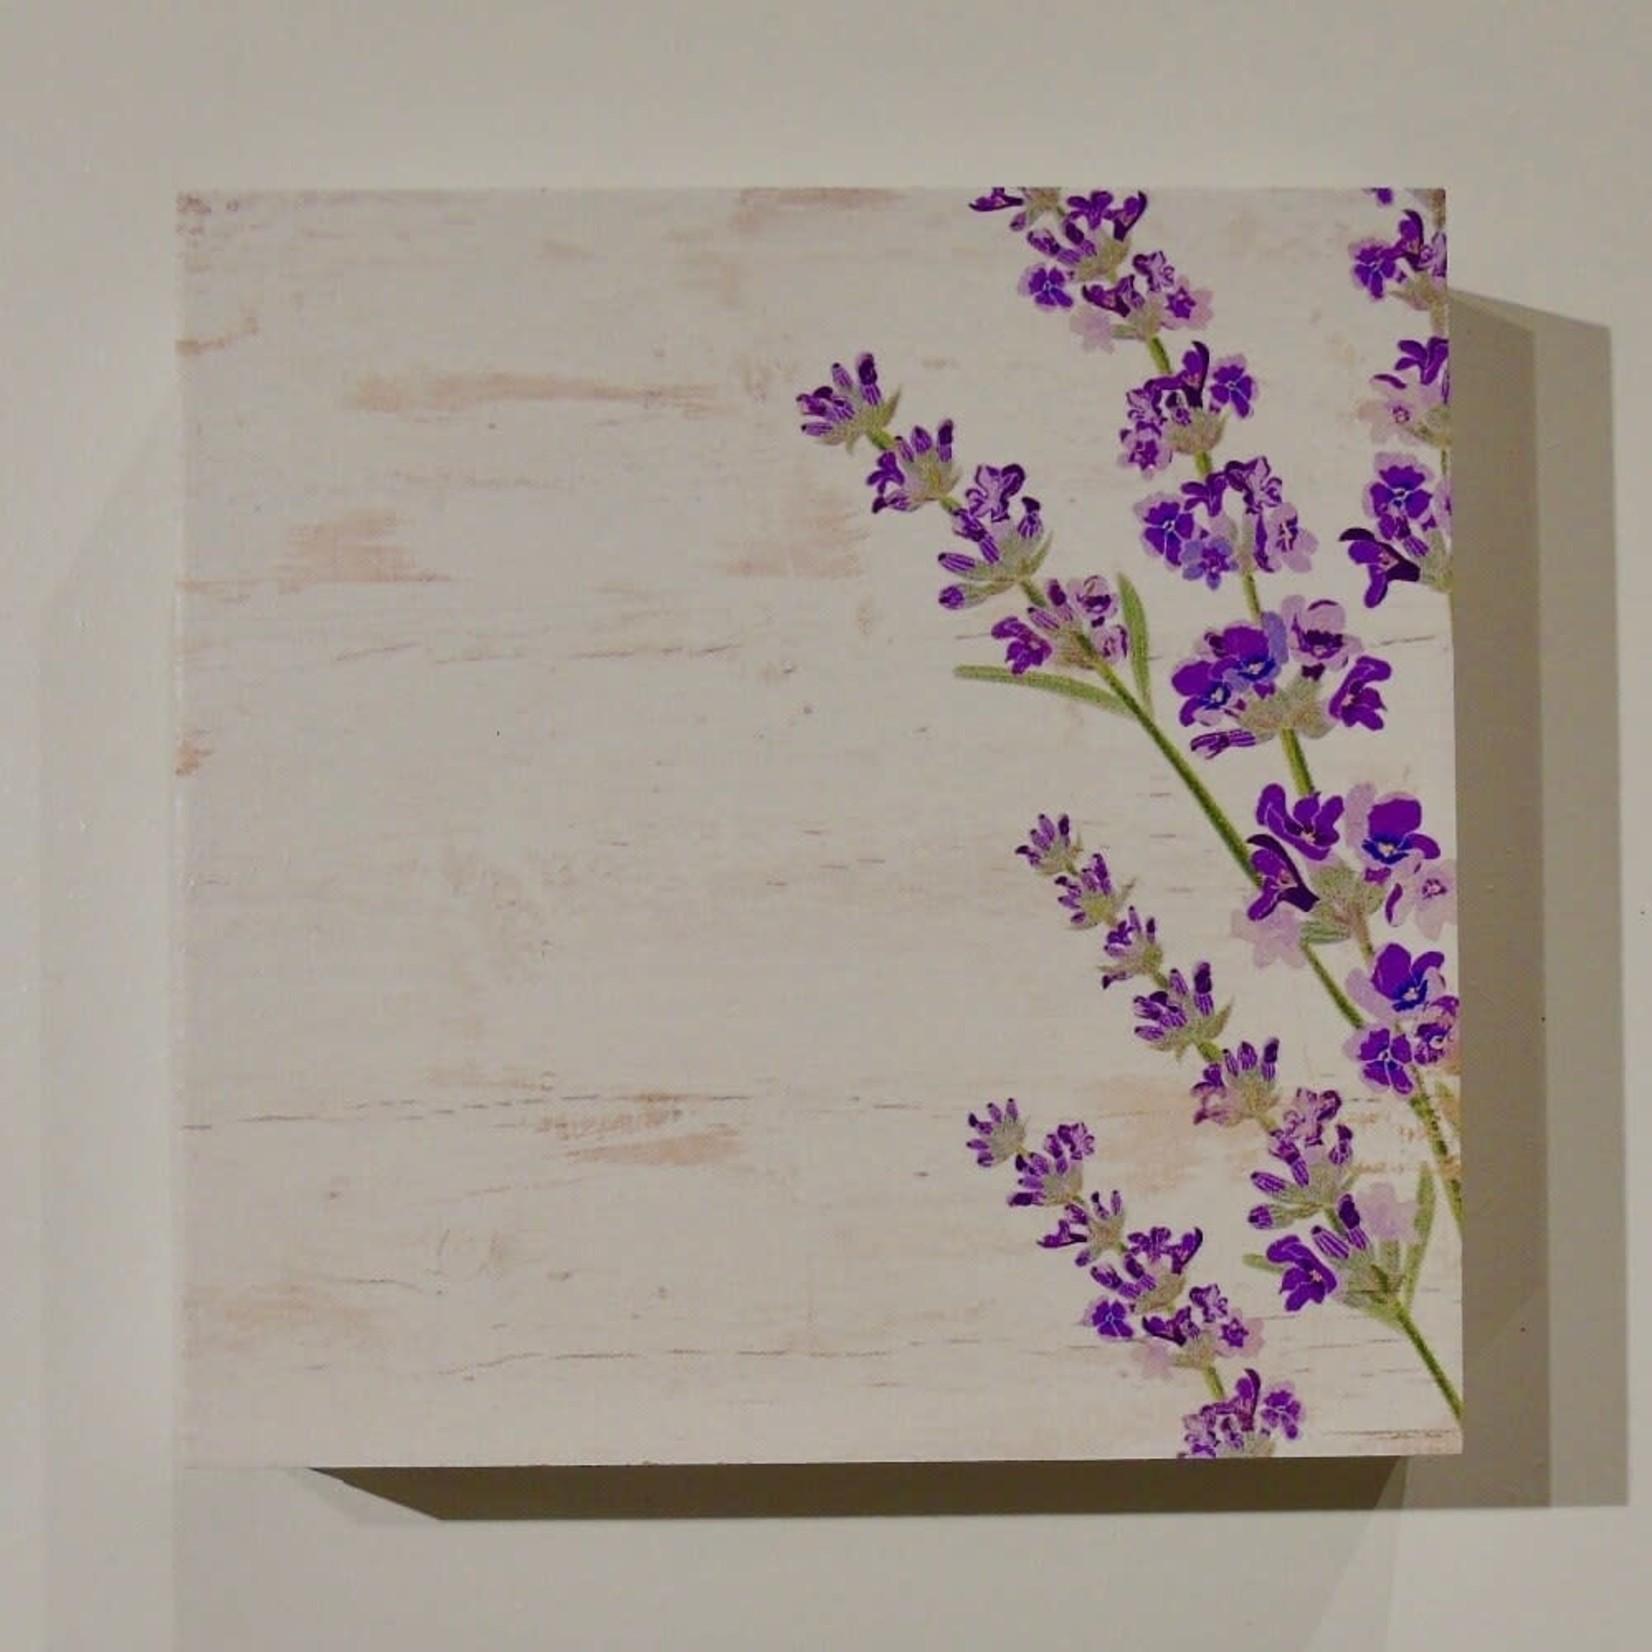 "Floral Sign (5.75x5.75"")"